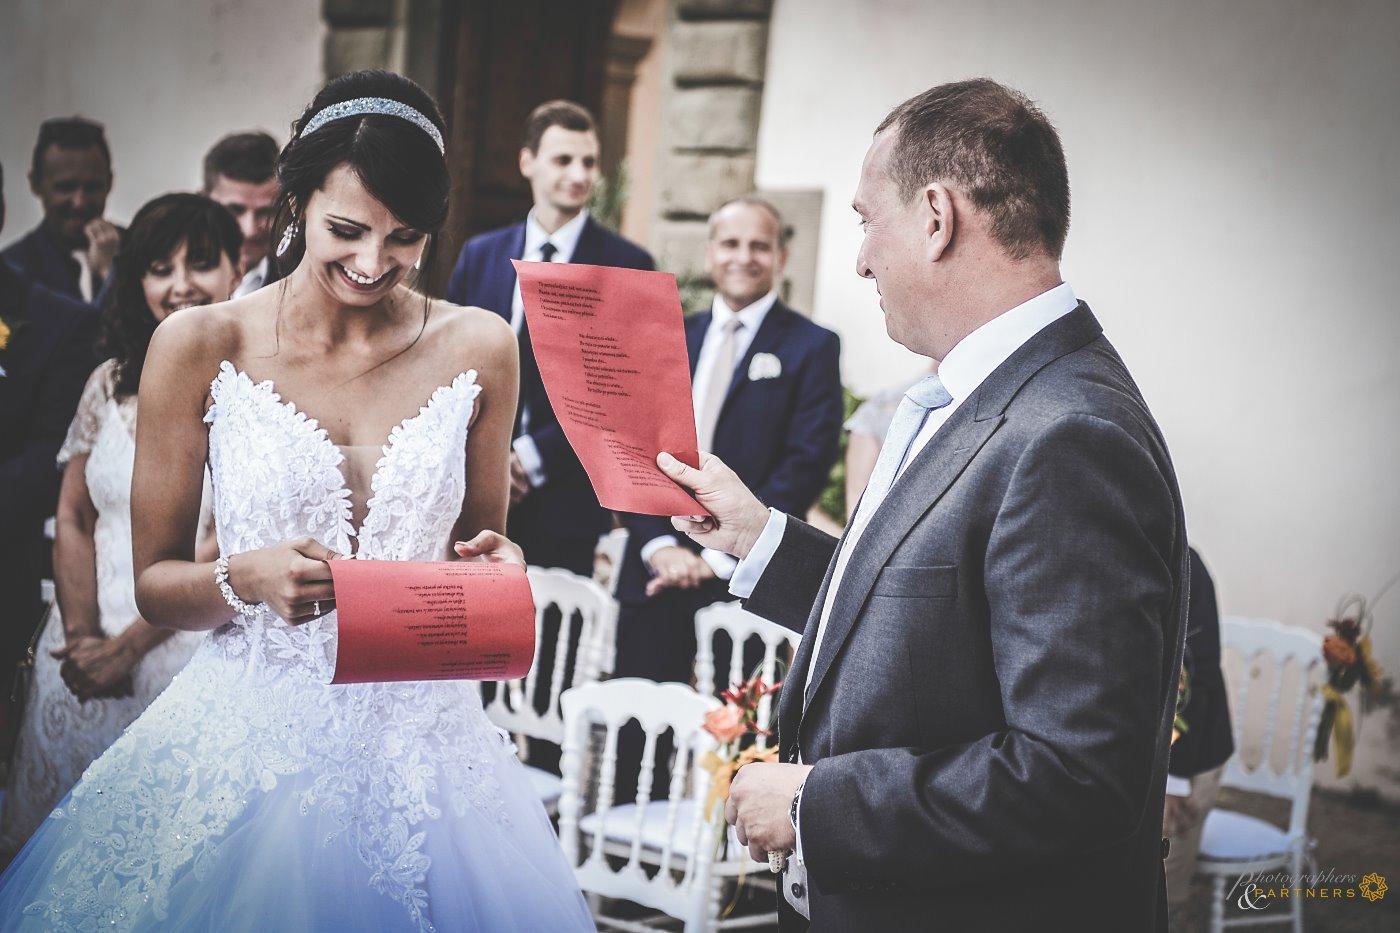 photography_weddings_vicchiomaggio_10.jpg